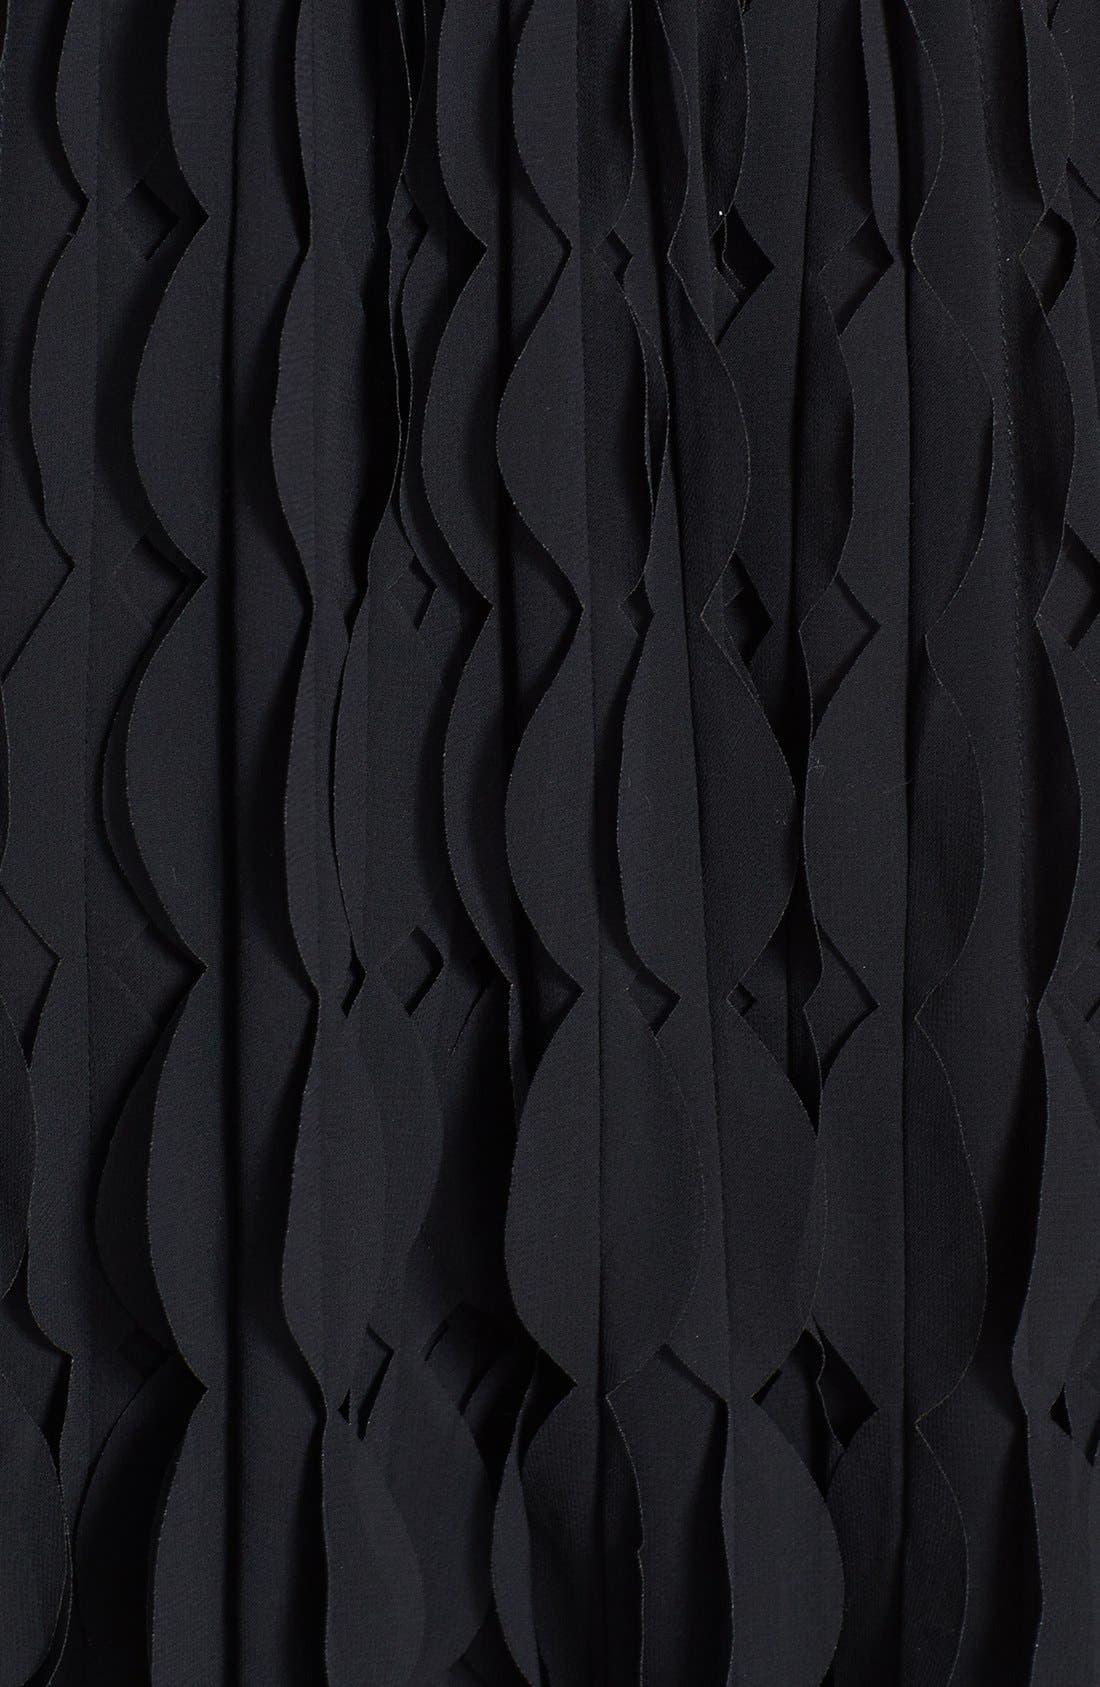 Alternate Image 3  - Diane von Furstenberg 'Gia' Ruffle Skirt Fit & Flare Dress